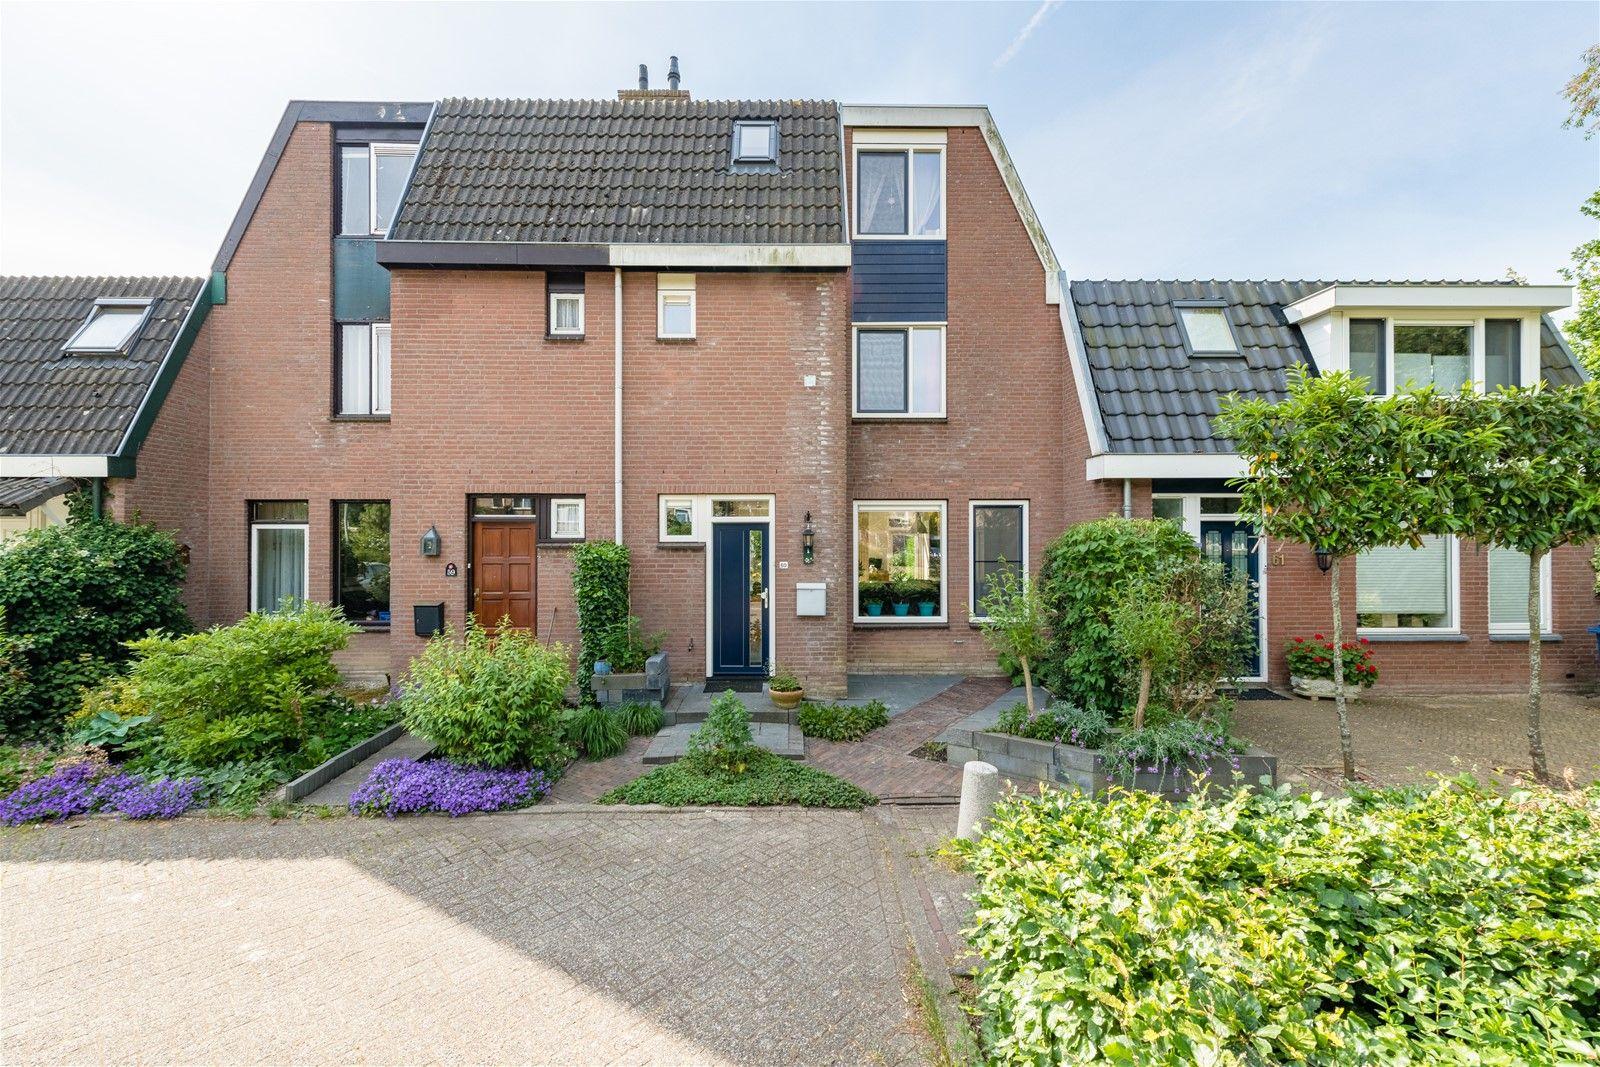 Kolkgriend 60, Almere